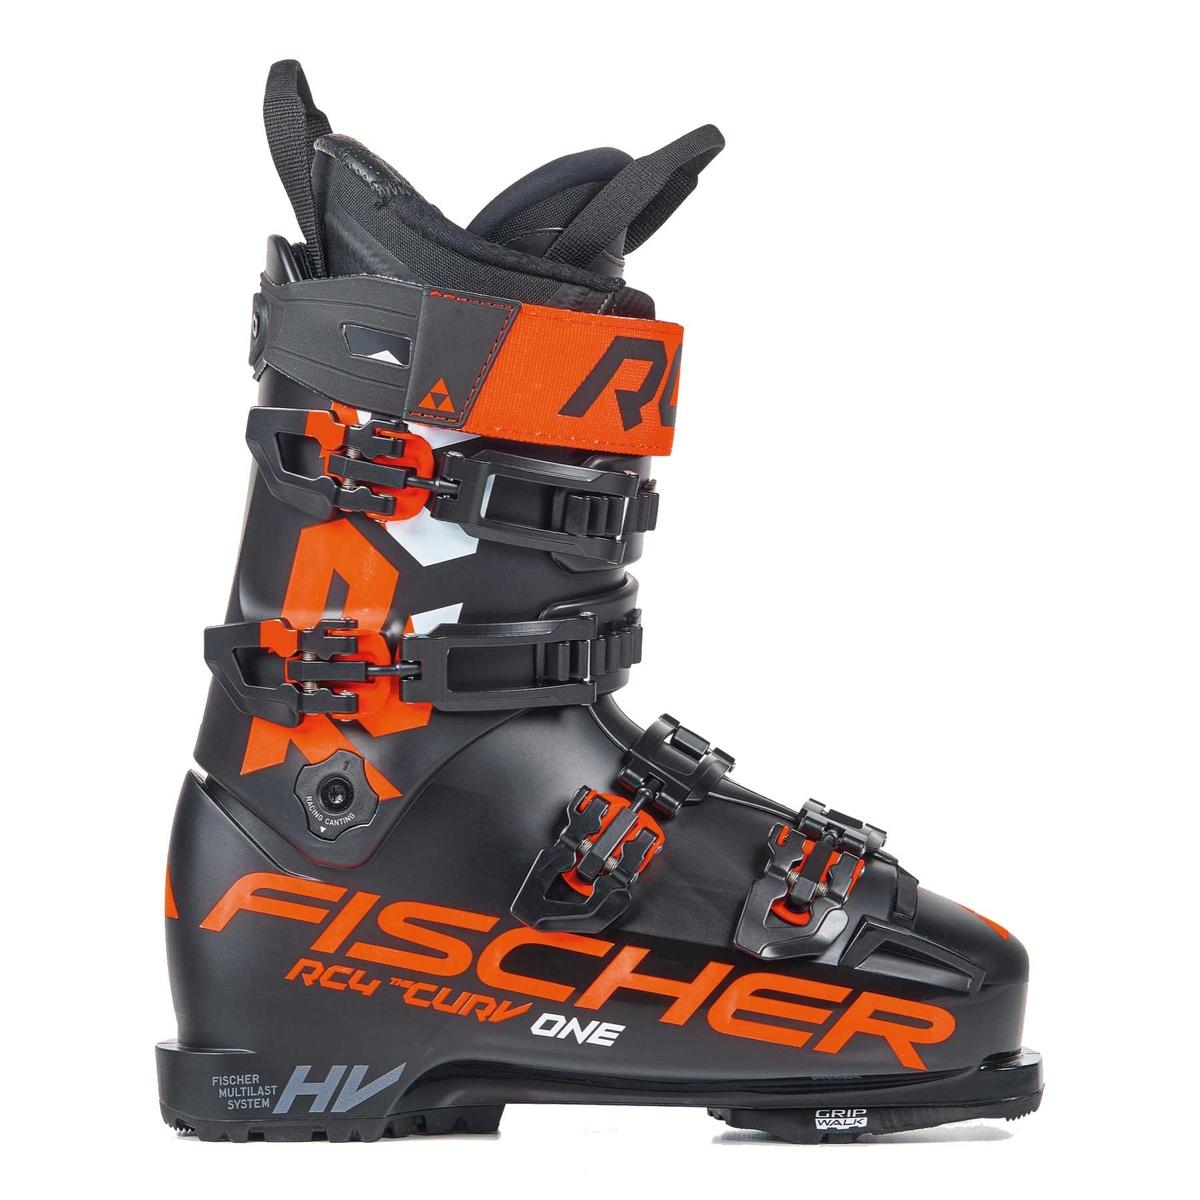 _PREMANUFACTURE_PRICE Fischer rc4 the curv one 120 vacuum walk